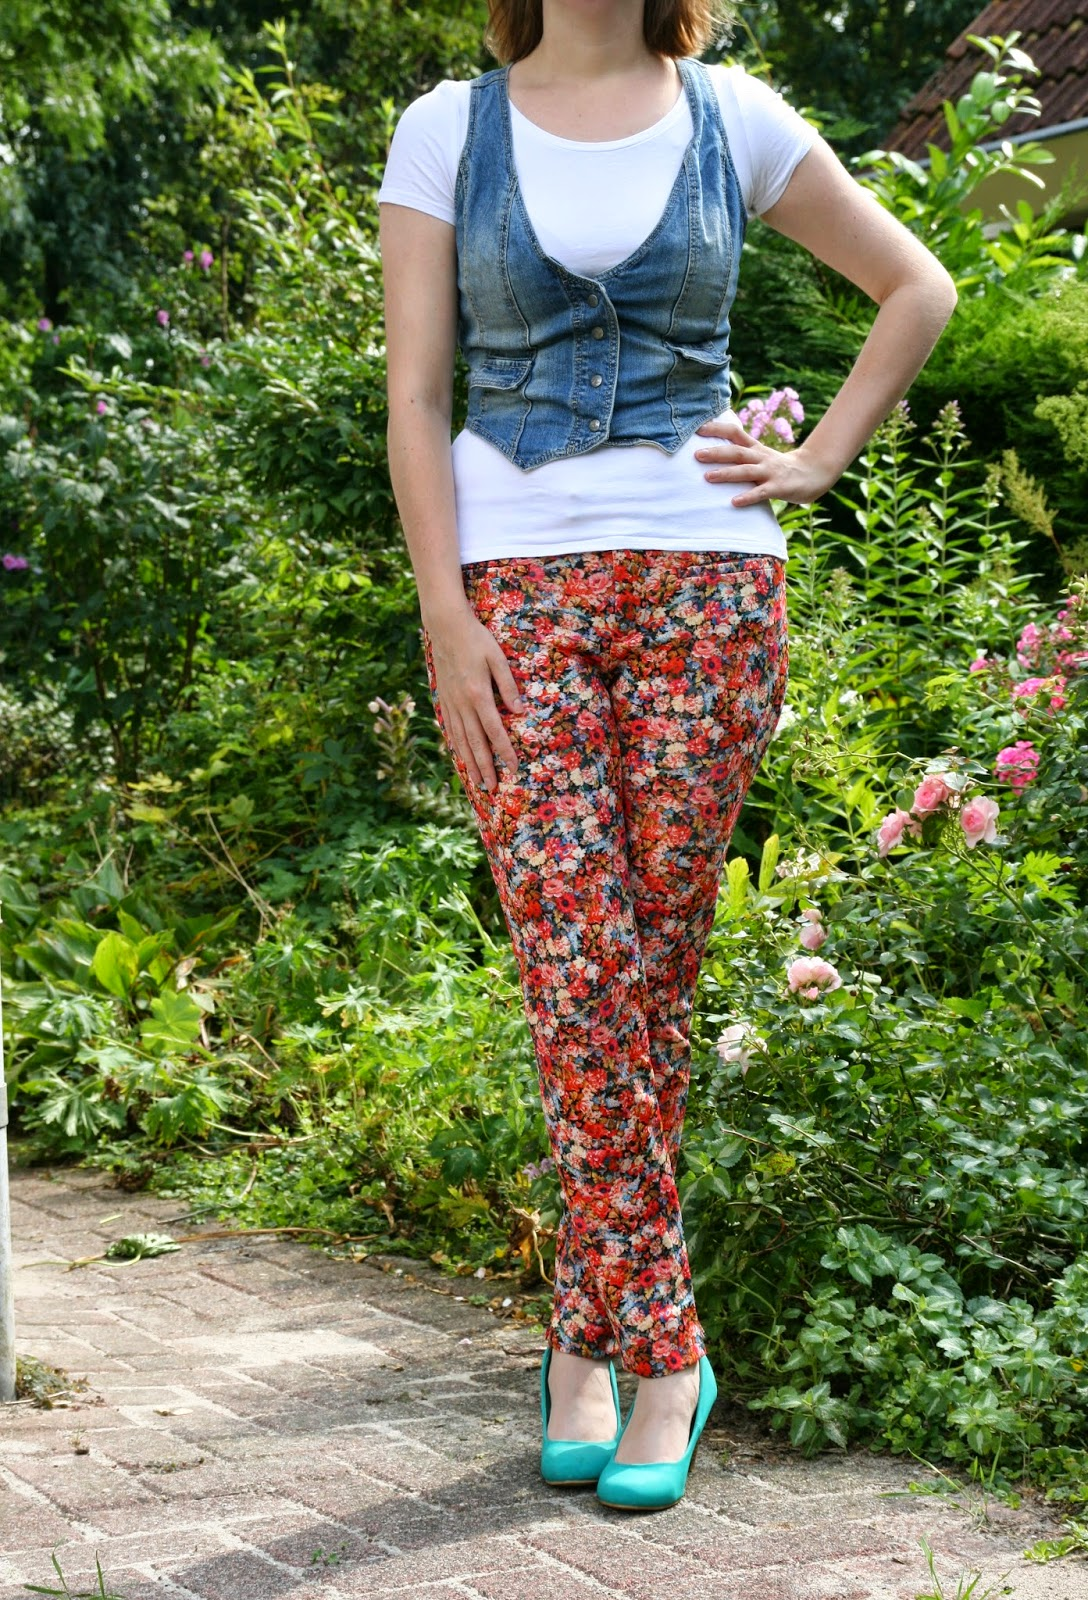 http://hmlovur.blogspot.nl/2014/08/outfits-of-week-week-31.html